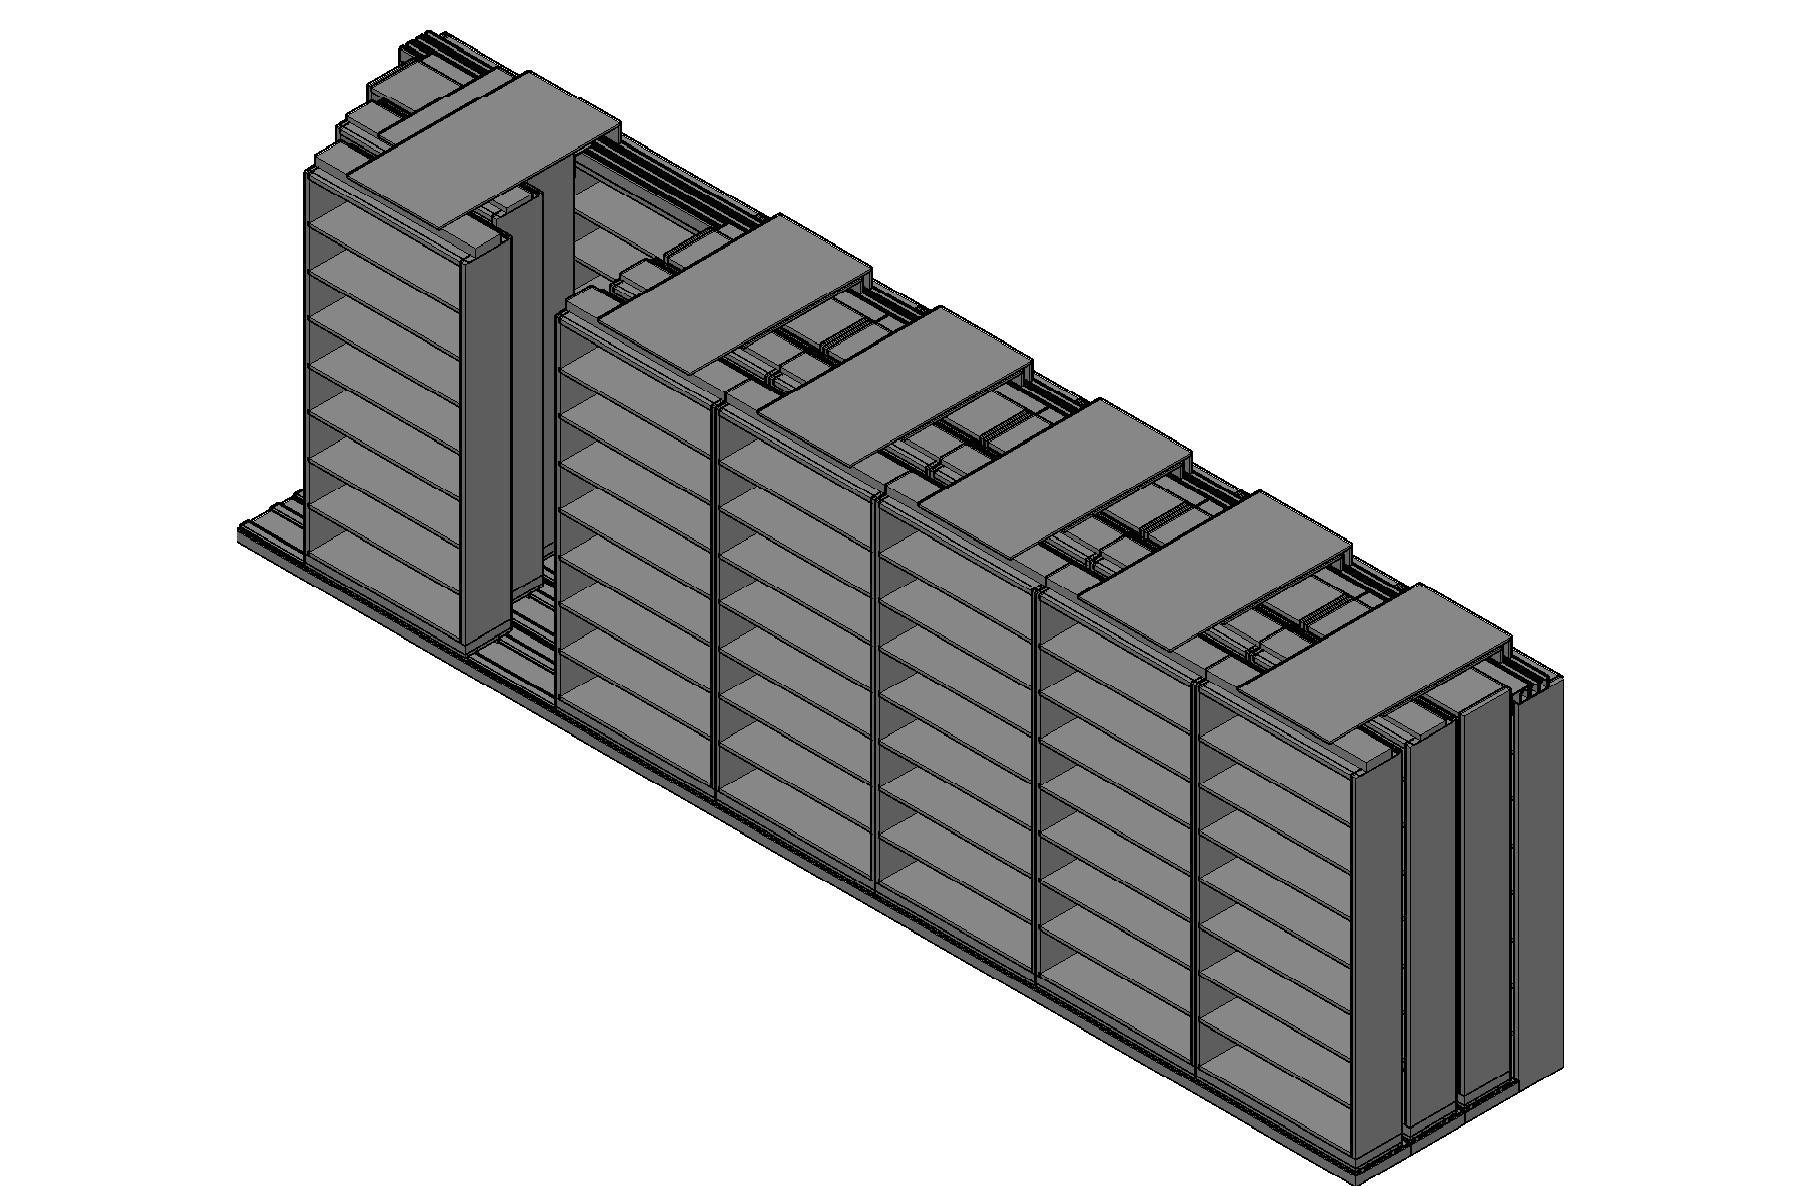 "Letter Size Sliding Shelves - 4 Rows Deep - 8 Levels - (42"" x 12"" Shelves) - 298"" Total Width"